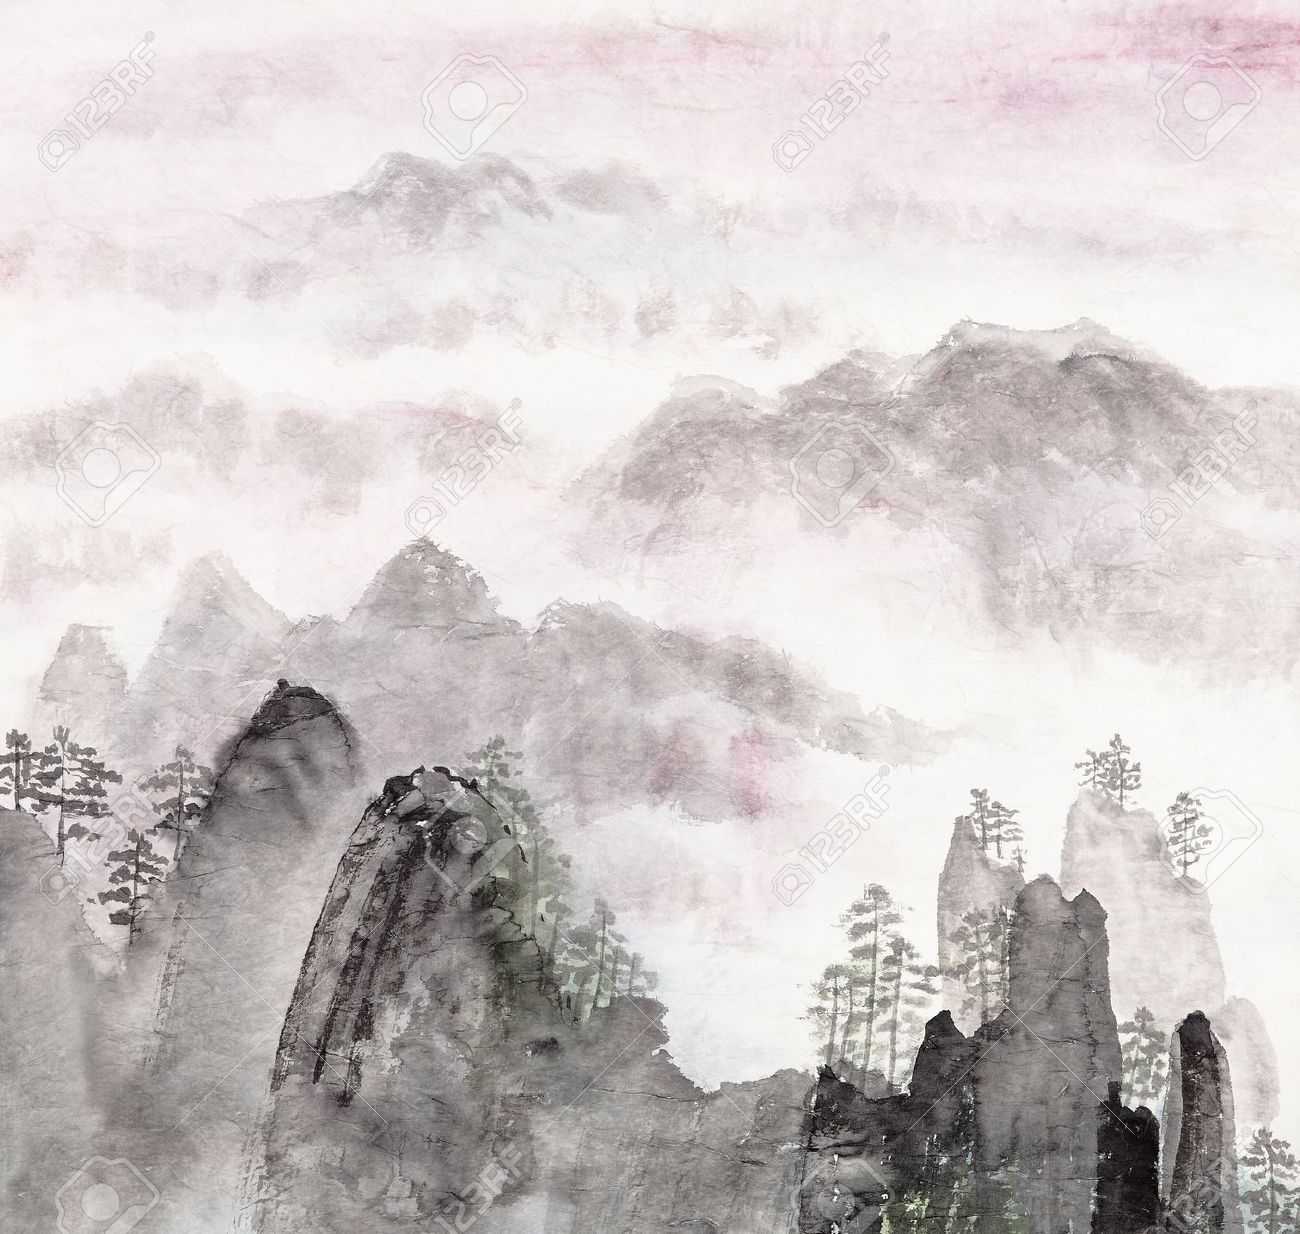 chinese art mountains - photo #5